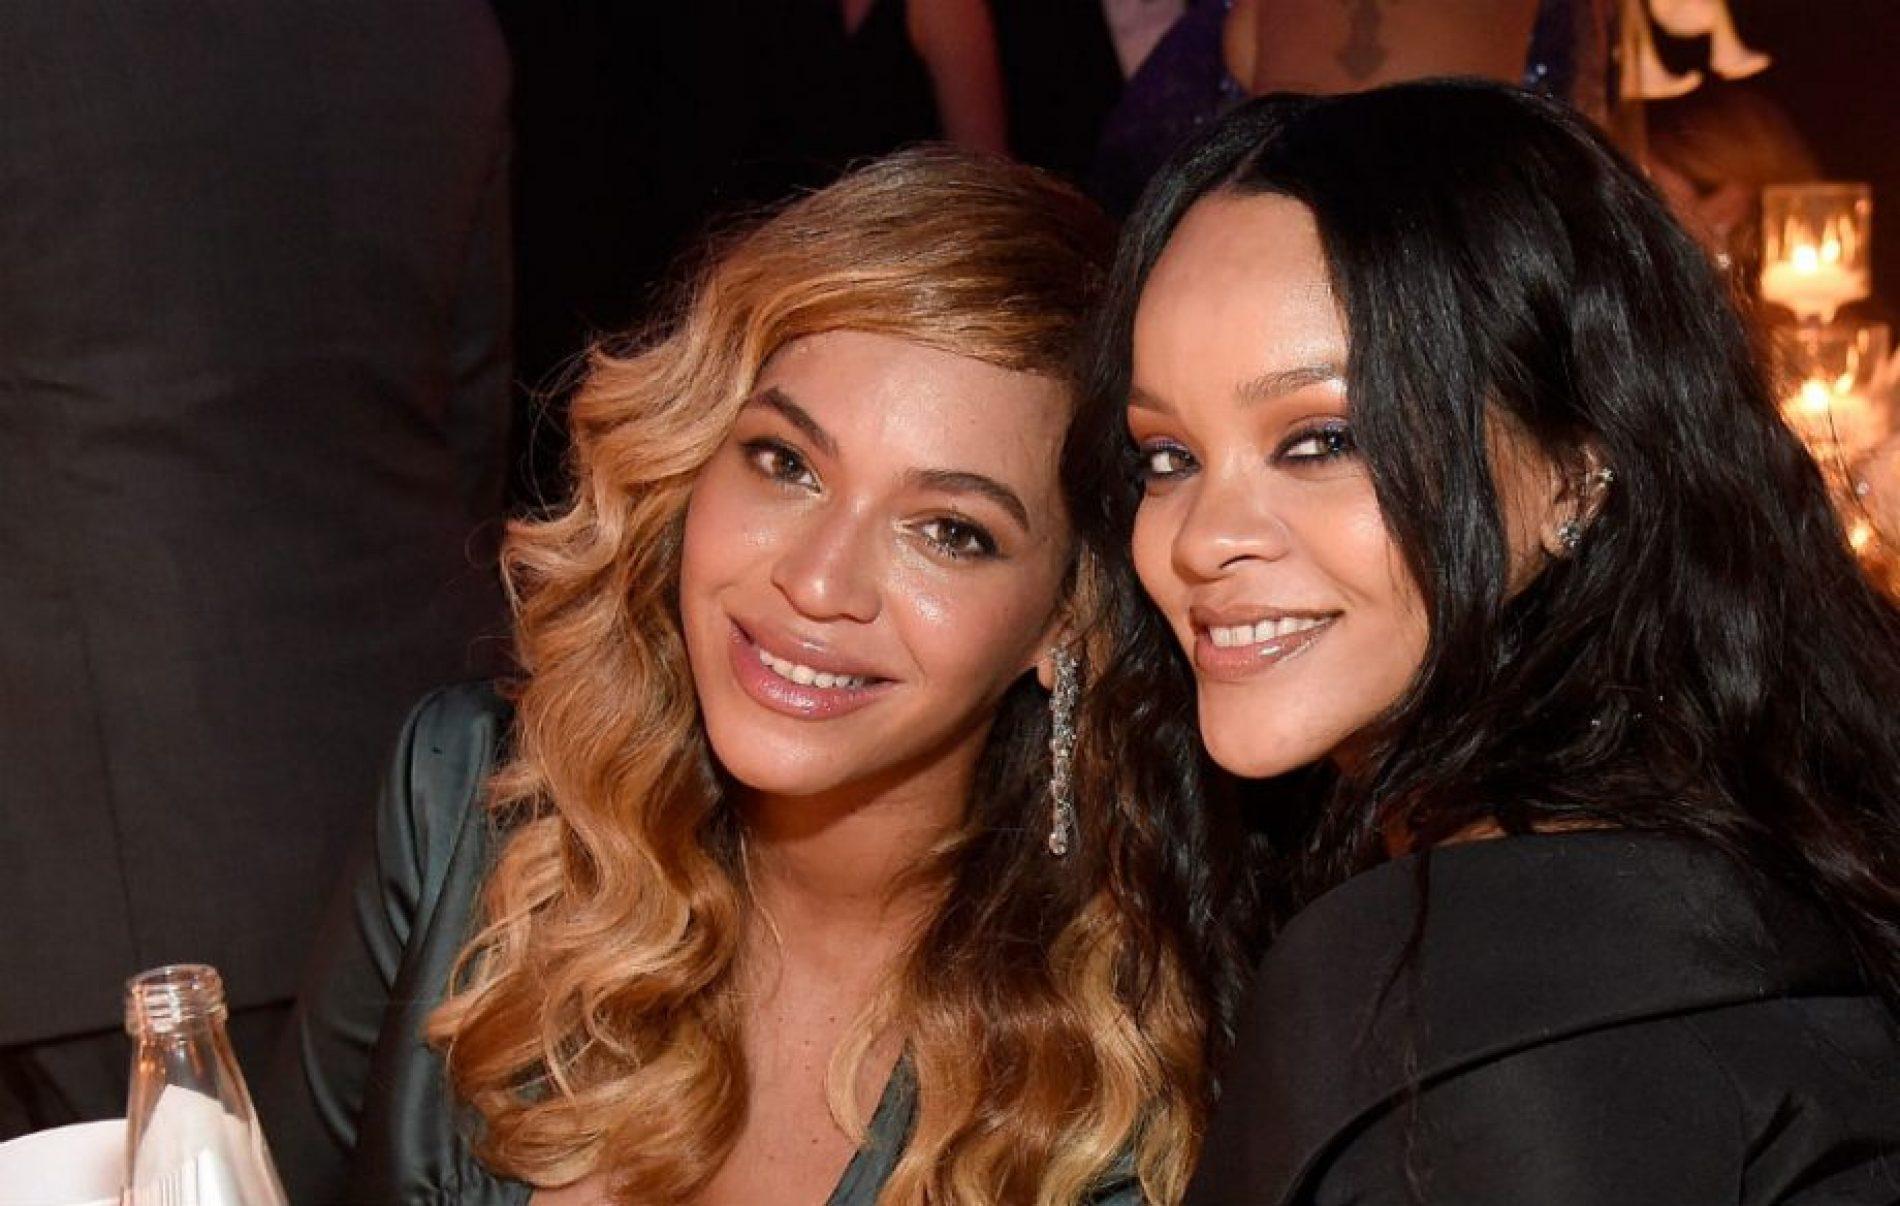 Beyoncé and Rihanna make Forbes' World's 100 Most Powerful Women 2019 List